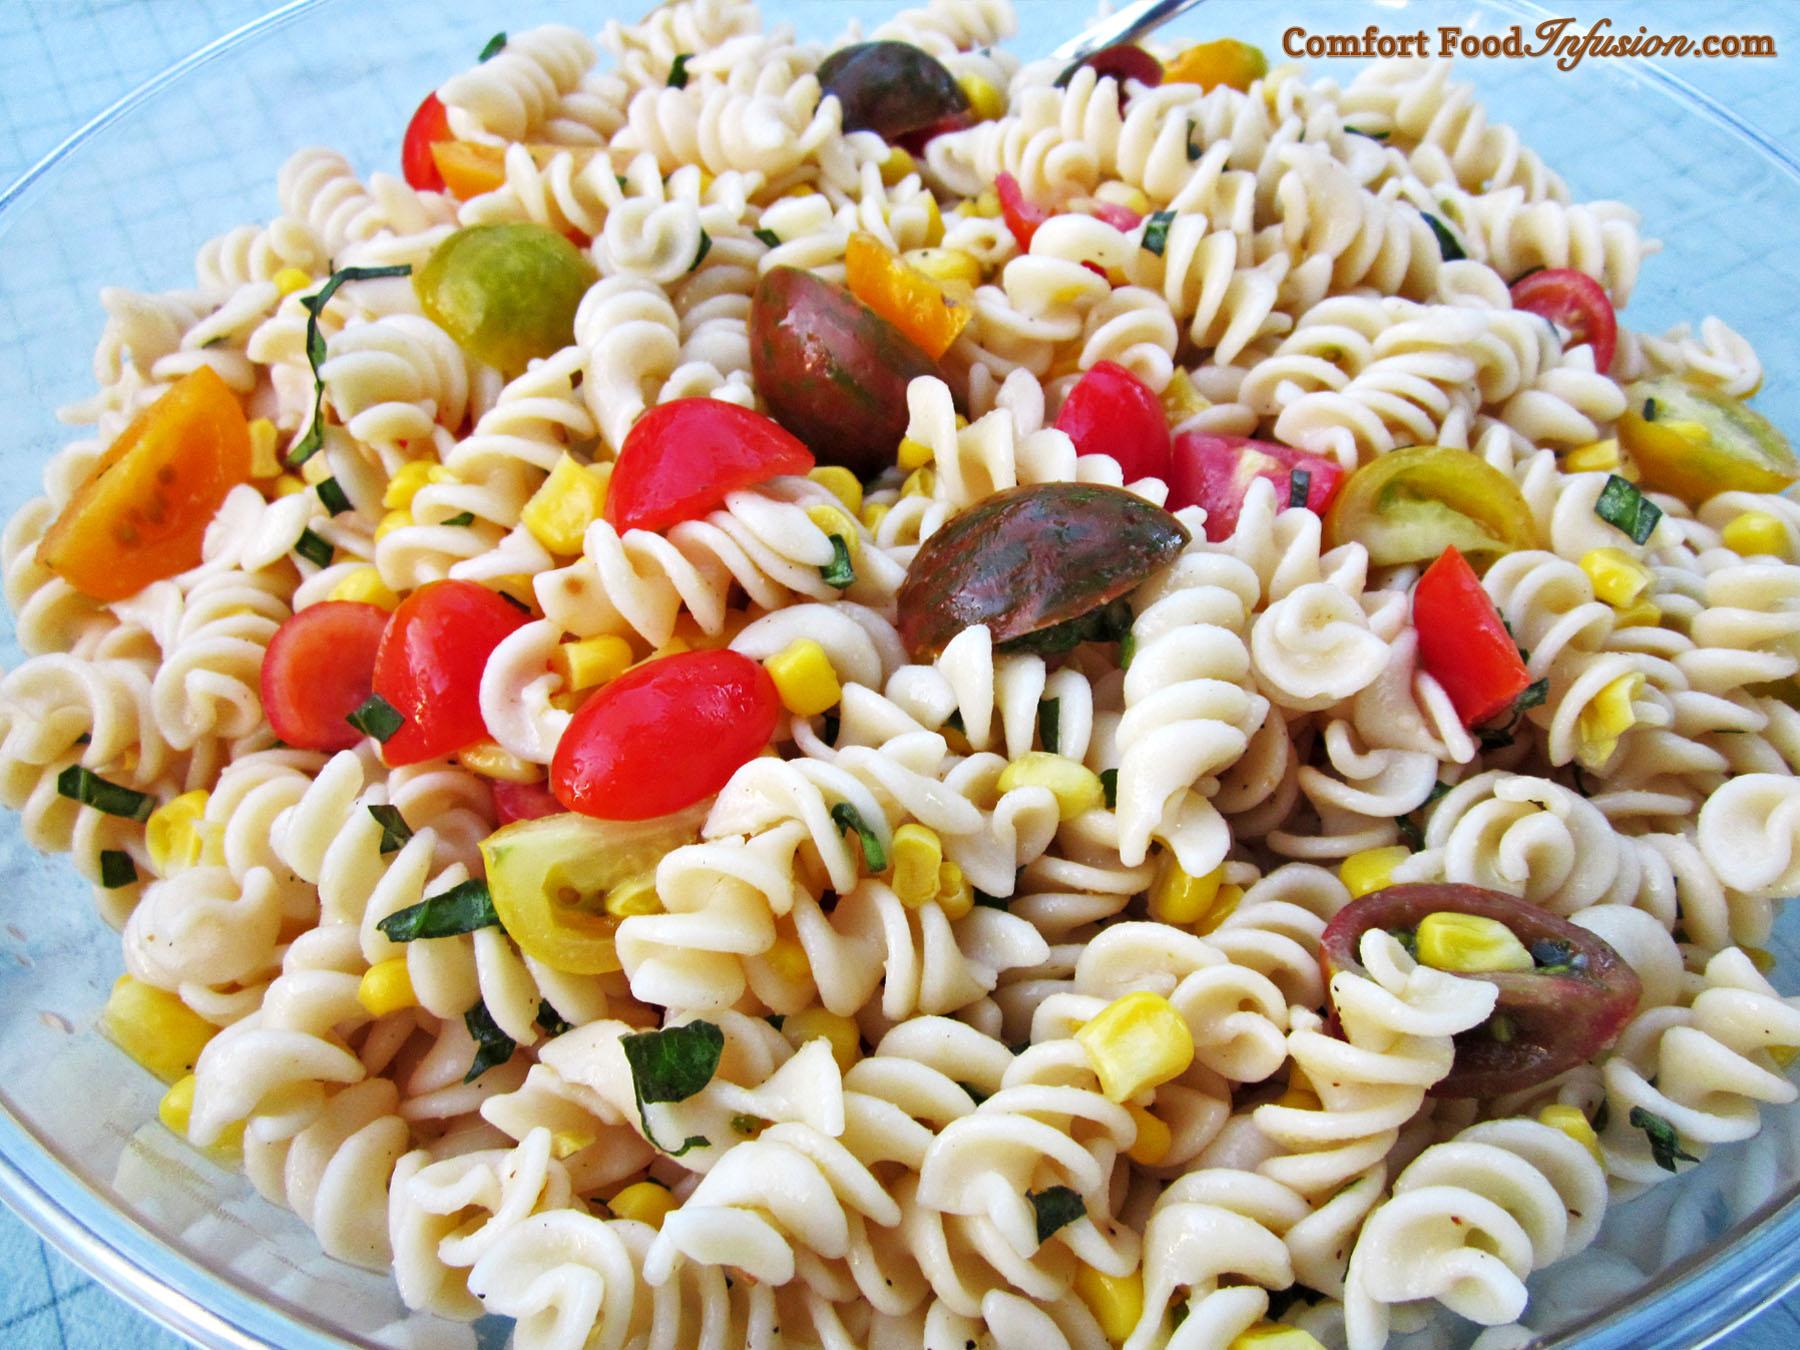 Tomato and Corn Pasta Salad